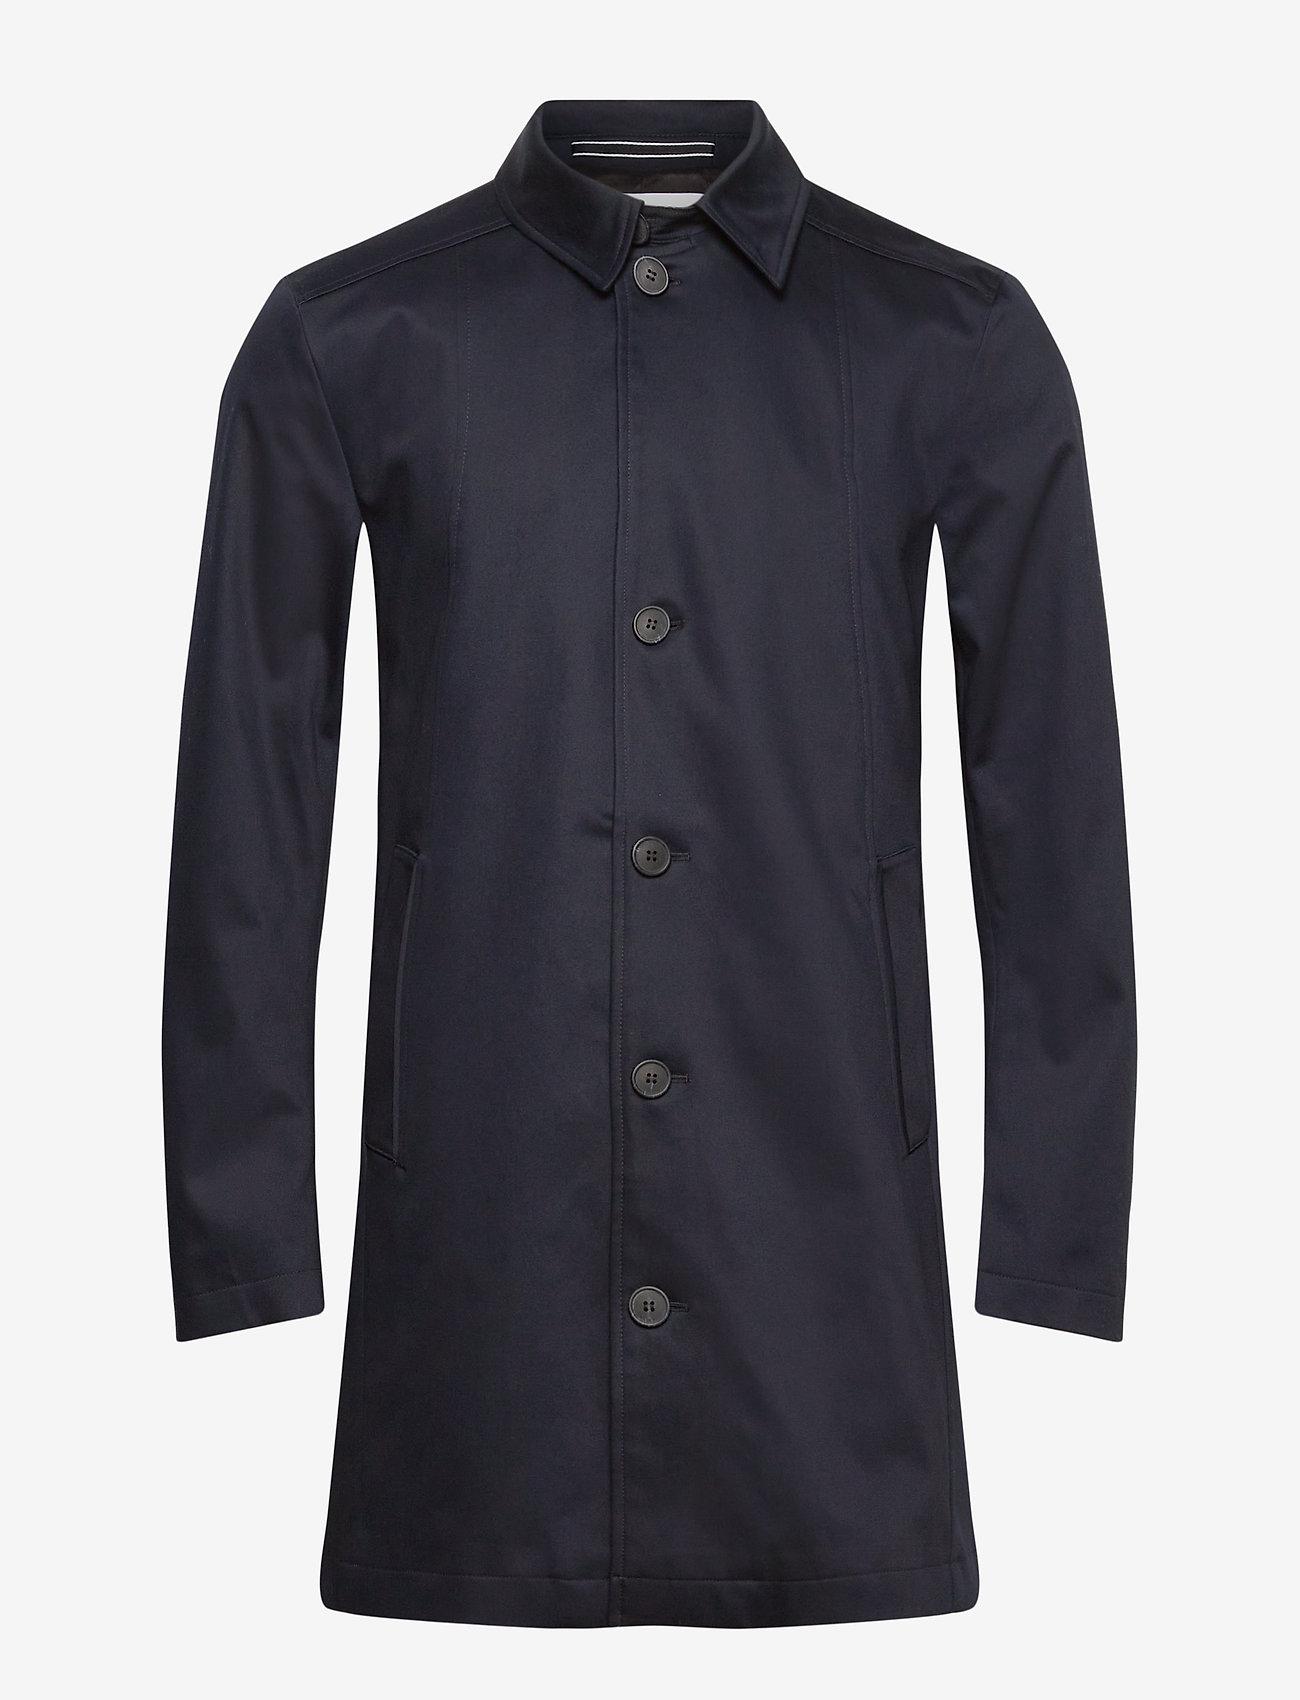 Selected Homme - SLHNEW TIMELESS COAT - manteaux legères - sky captain - 0